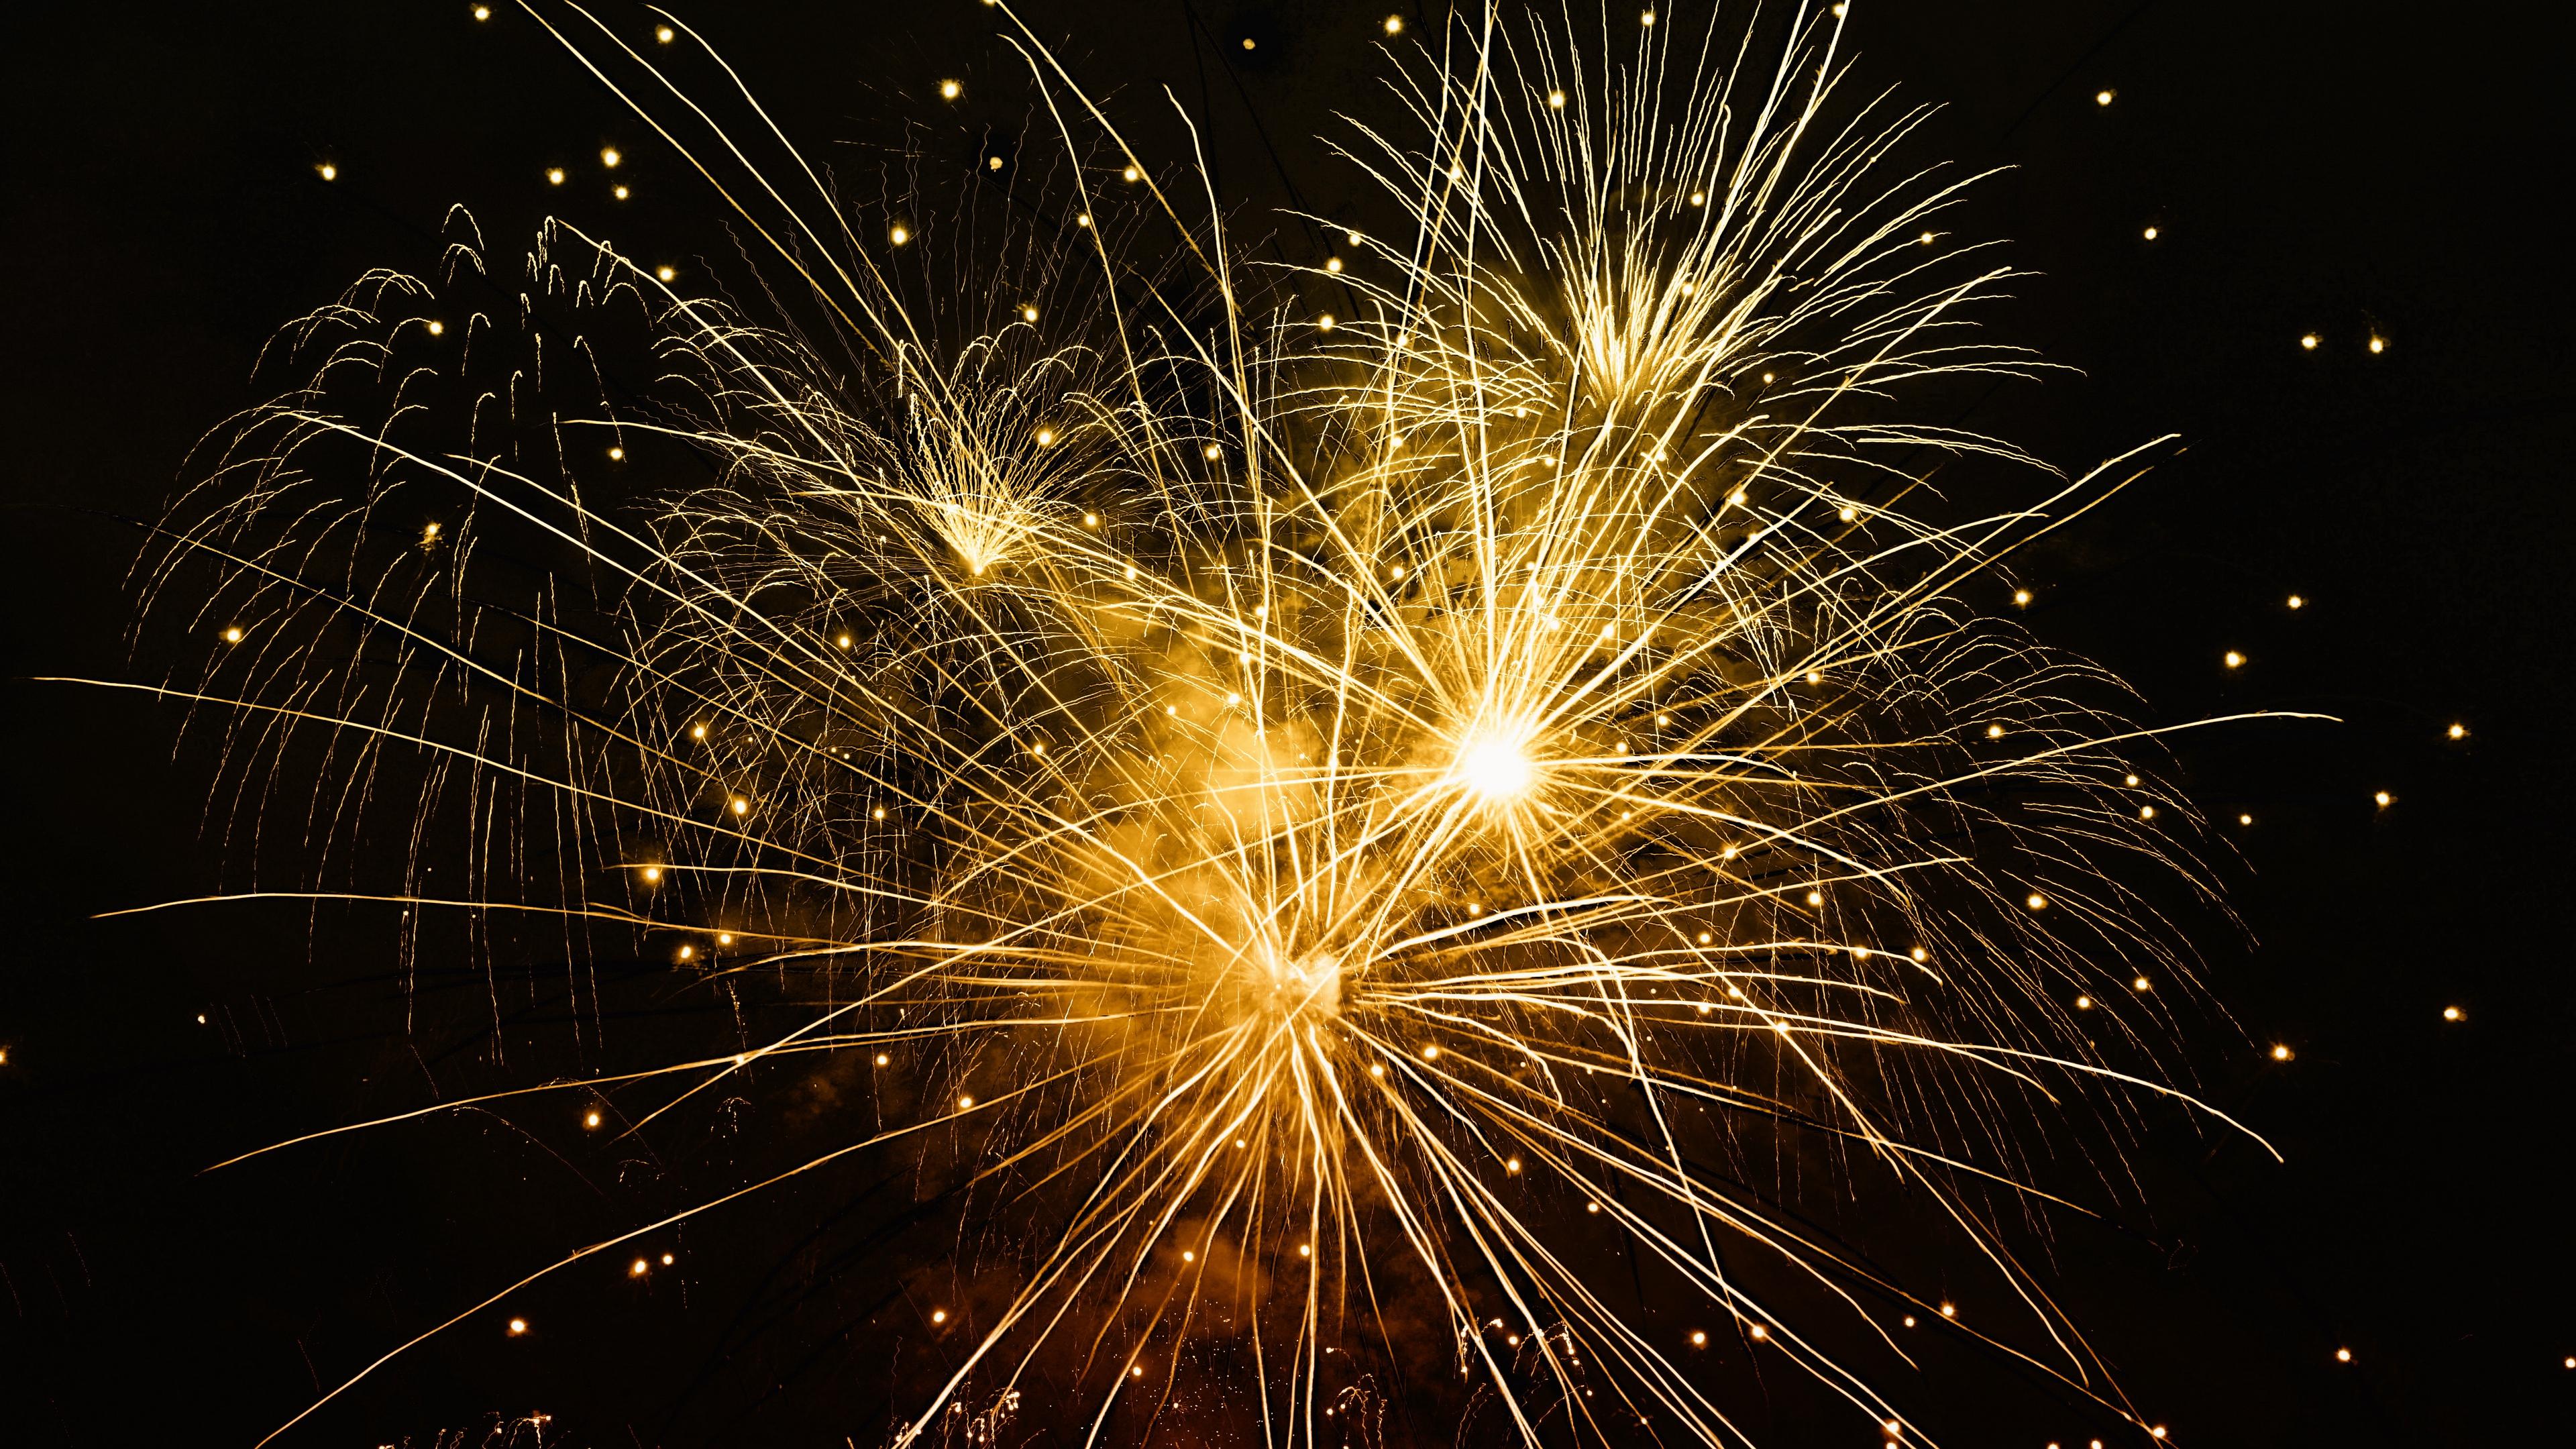 salute fireworks celebration 4k 1538344519 - salute, fireworks, celebration 4k - salute, Fireworks, Celebration